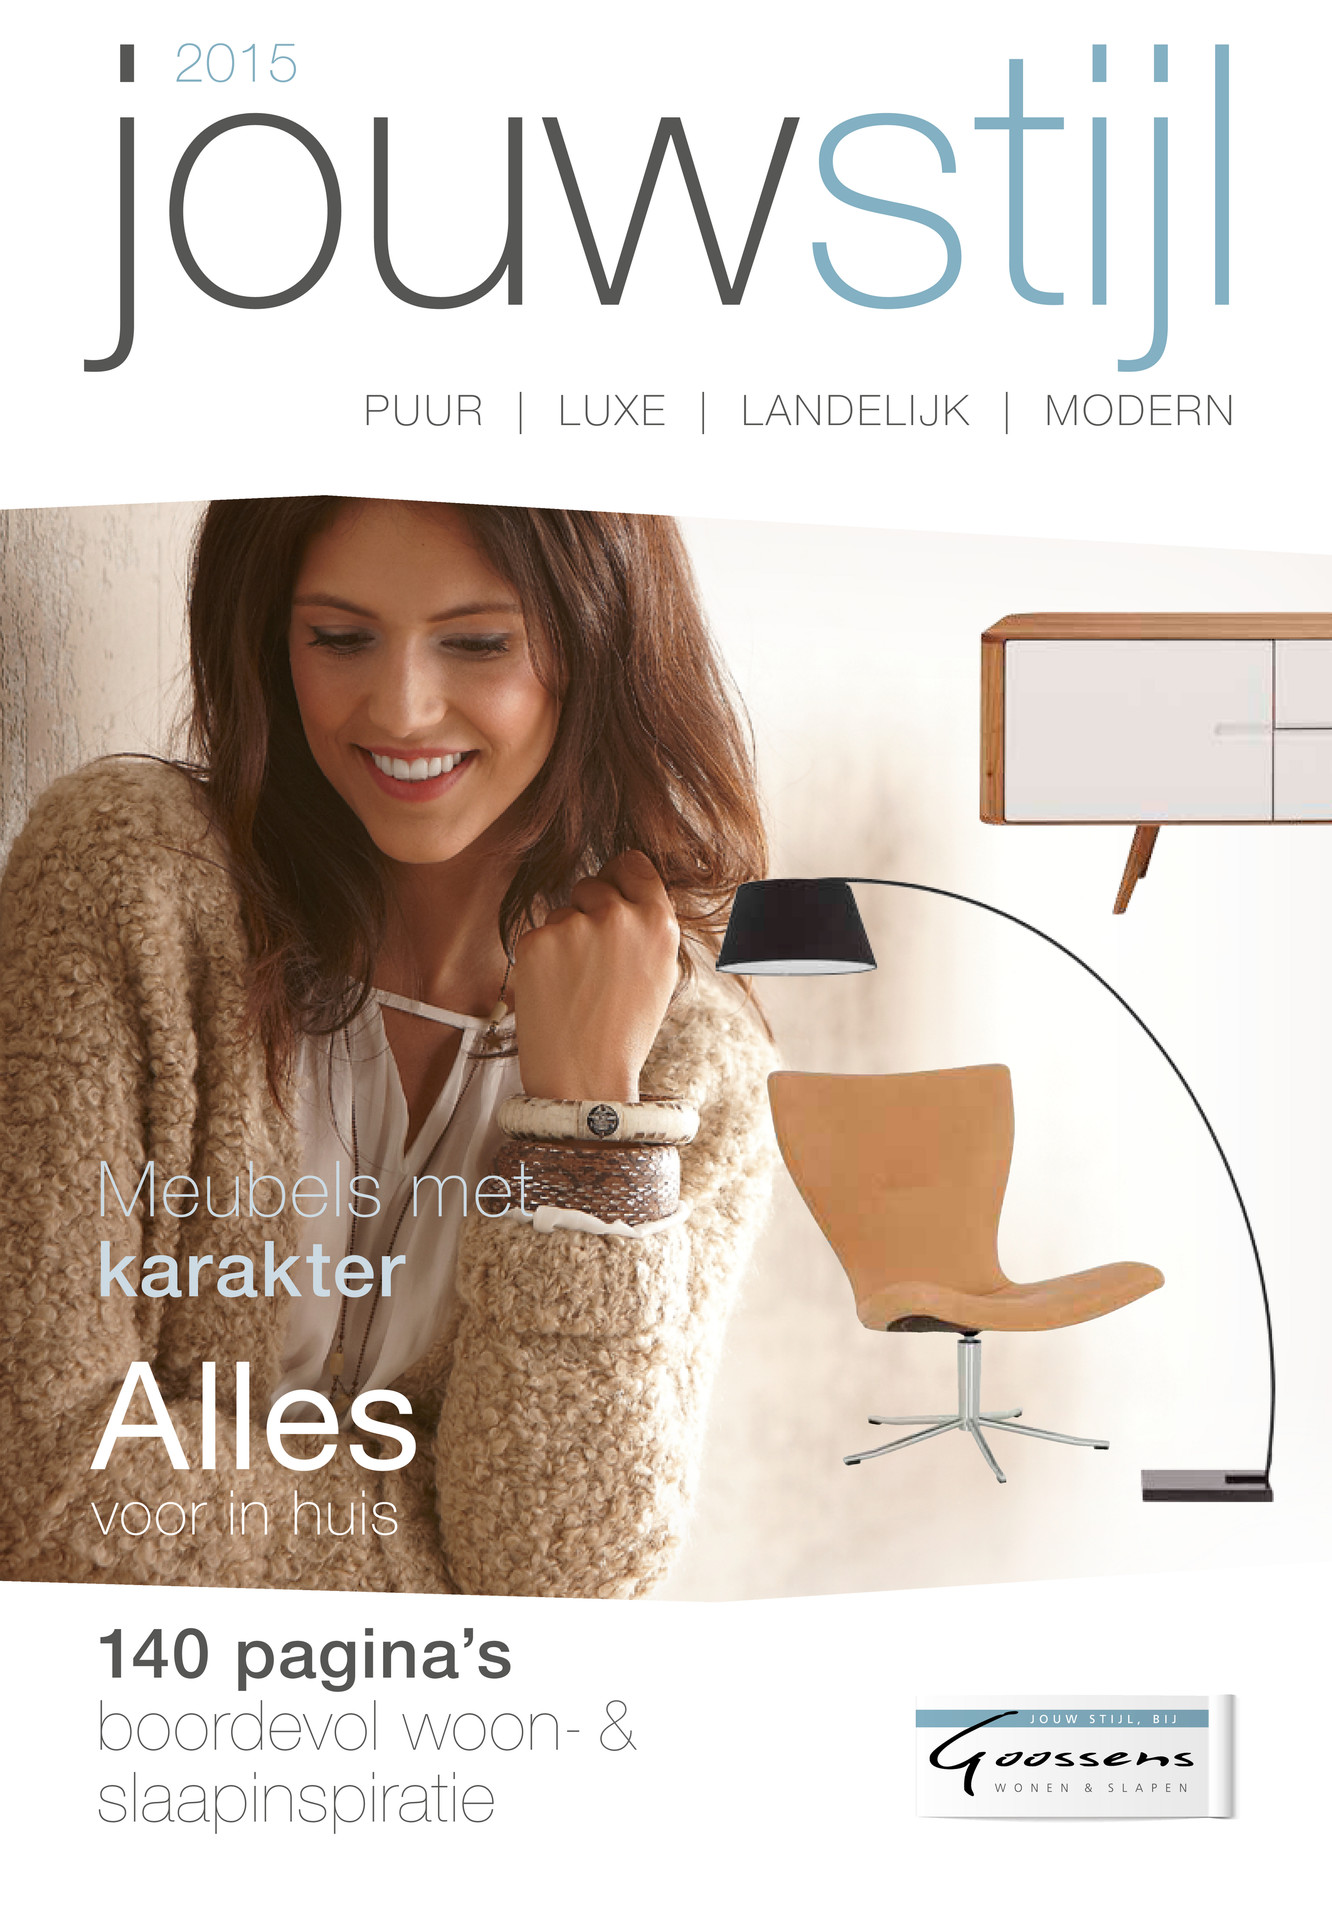 https://www.uw-woonmagazine.nl/uploads/website/UW_woonmagazine_nieuws/Goossens/Goossens_woonmagazine.jpg